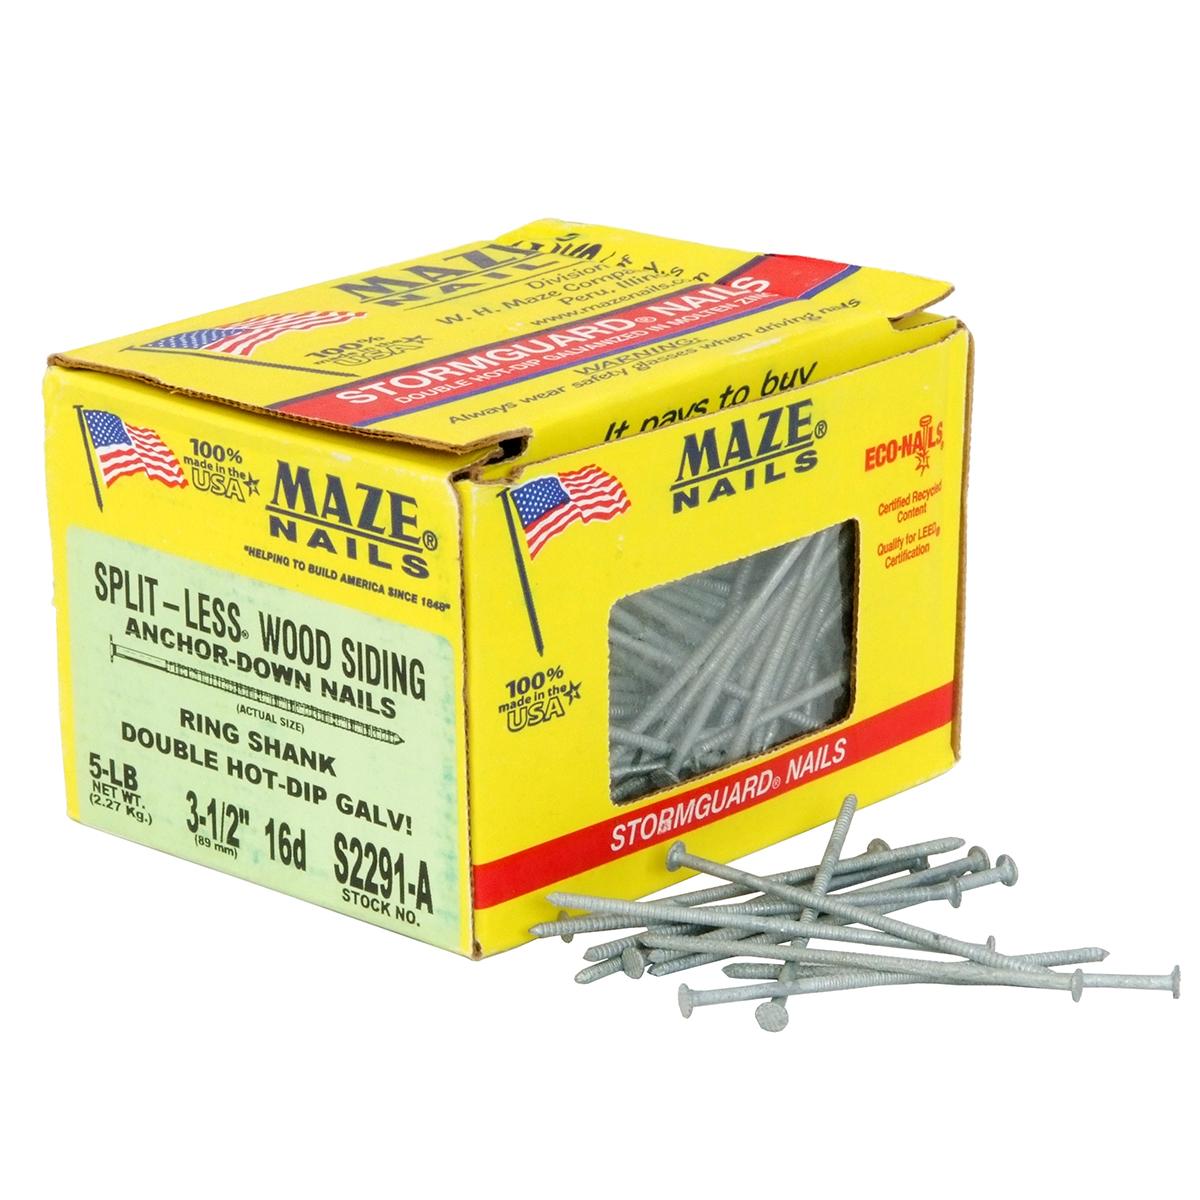 Maze Split Less 3 1 2 Quot Wood Siding Nails 5lb Box